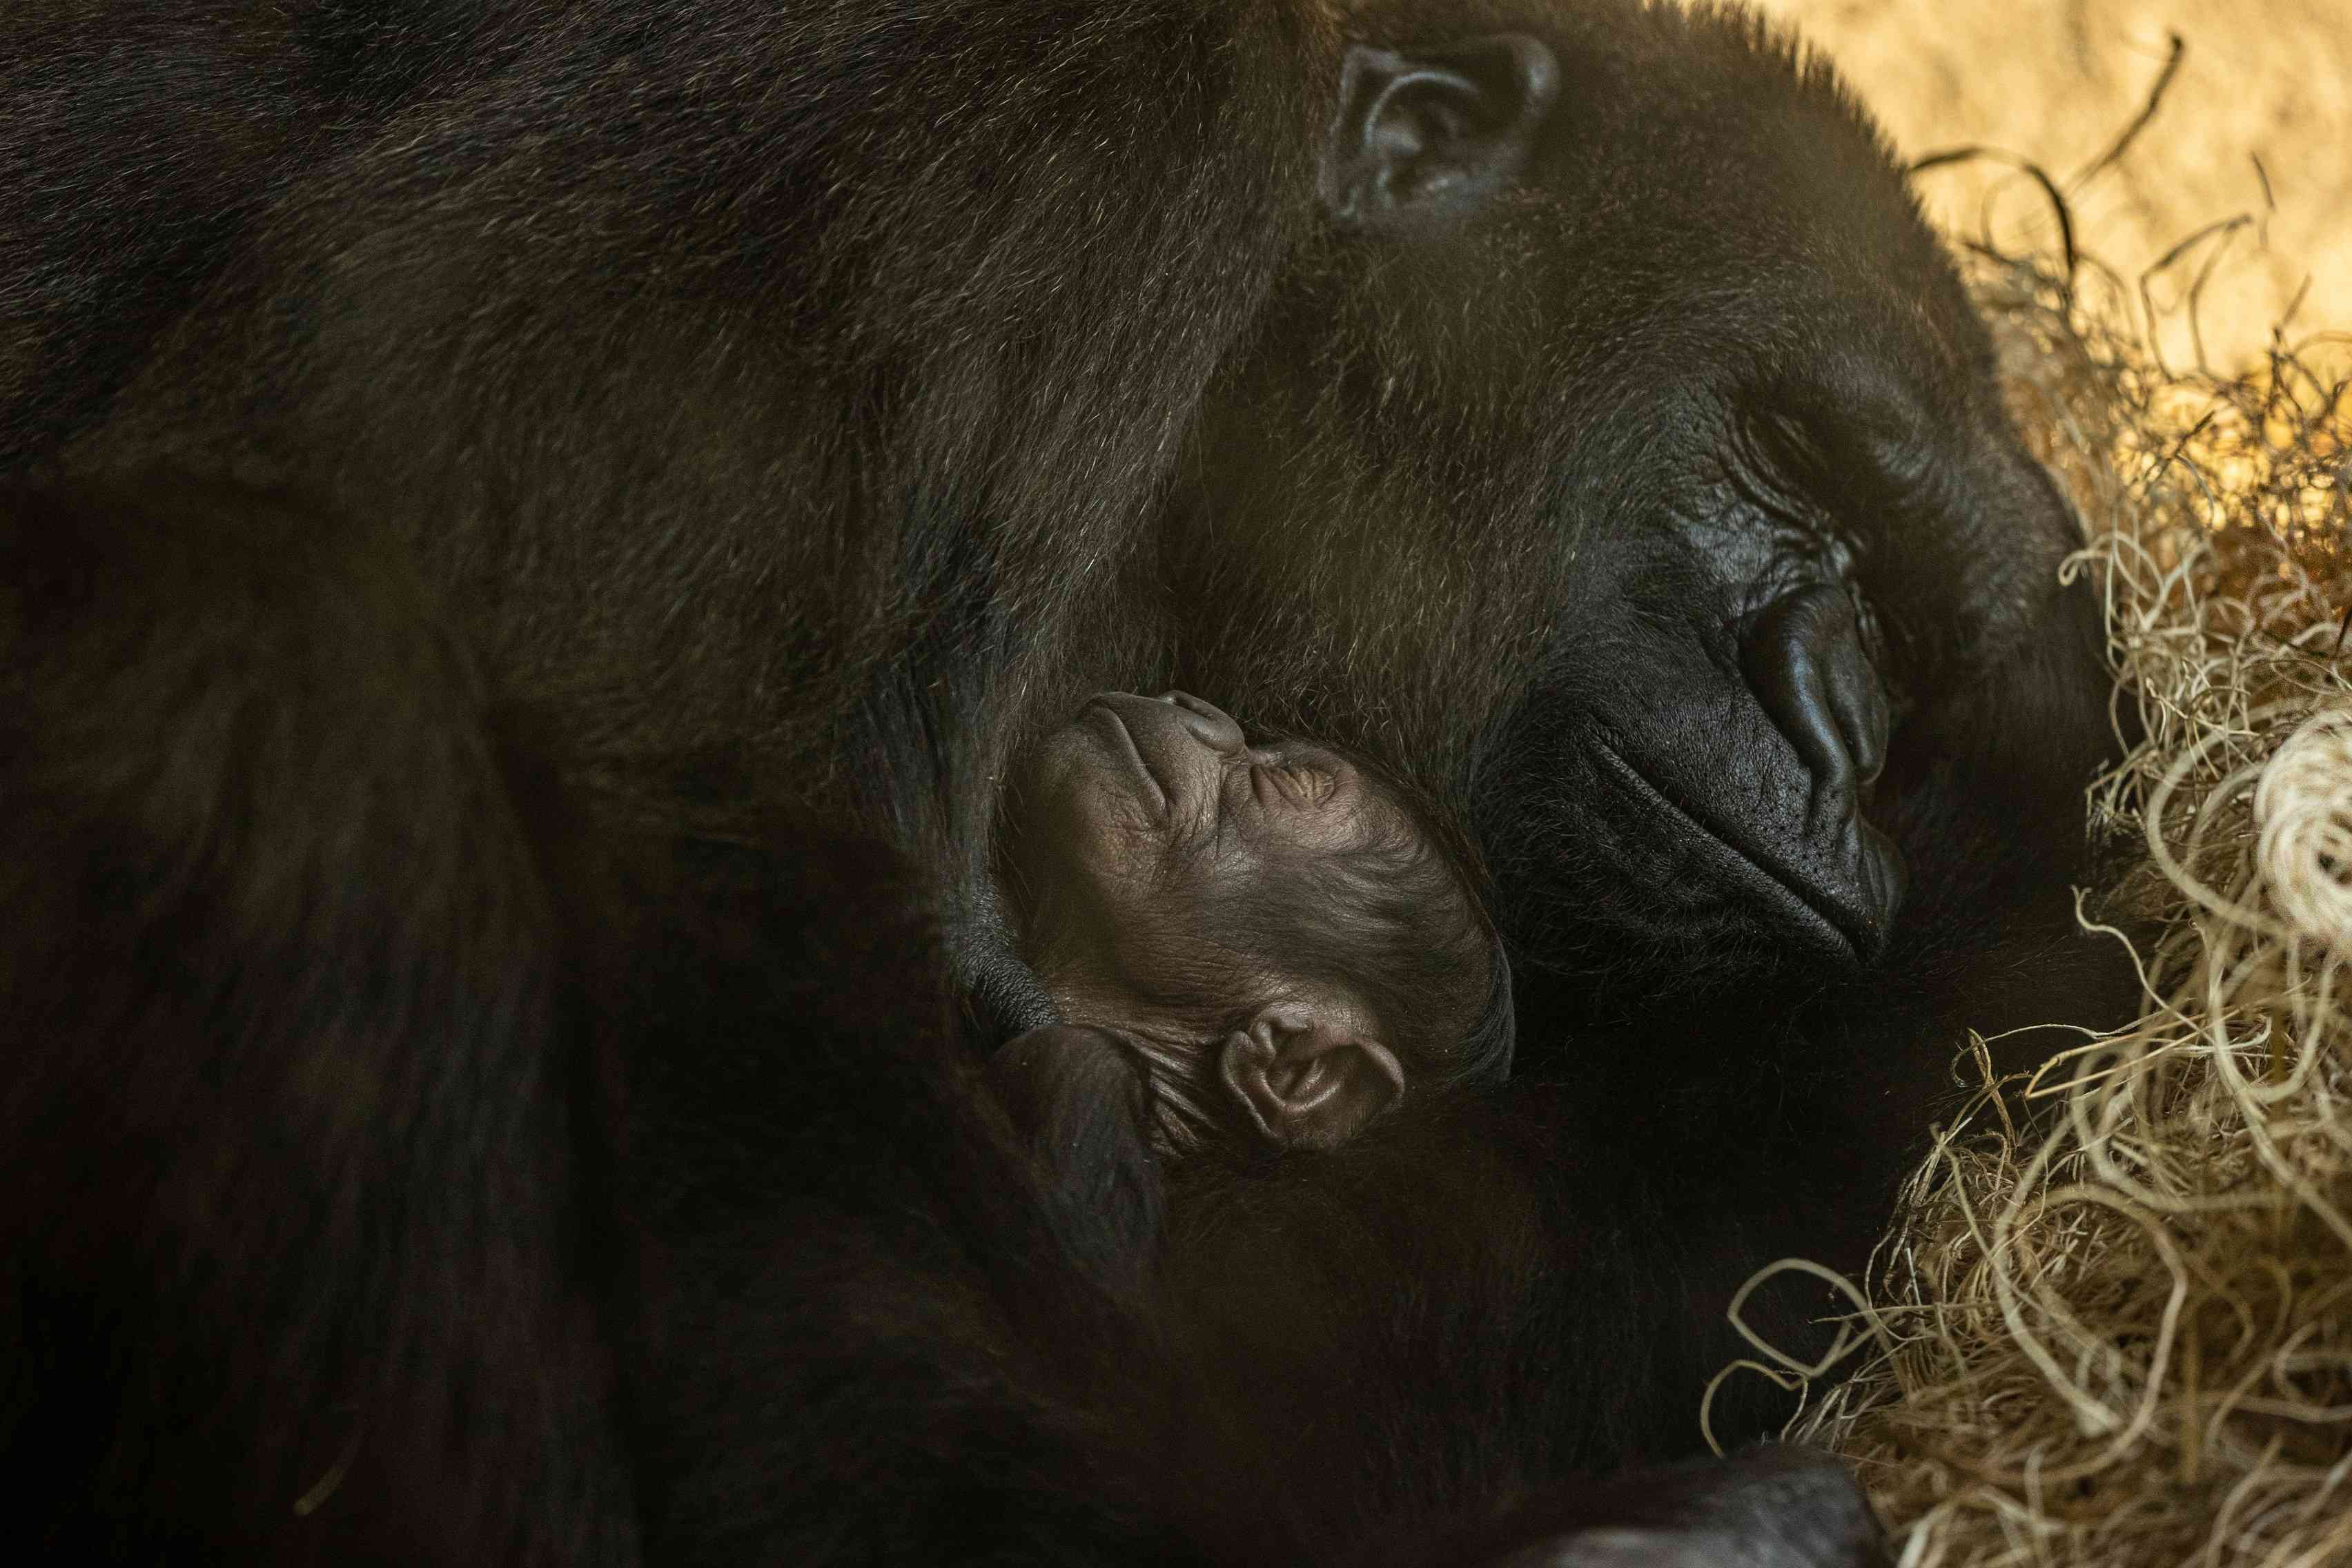 baby gorilla with mom, Madini